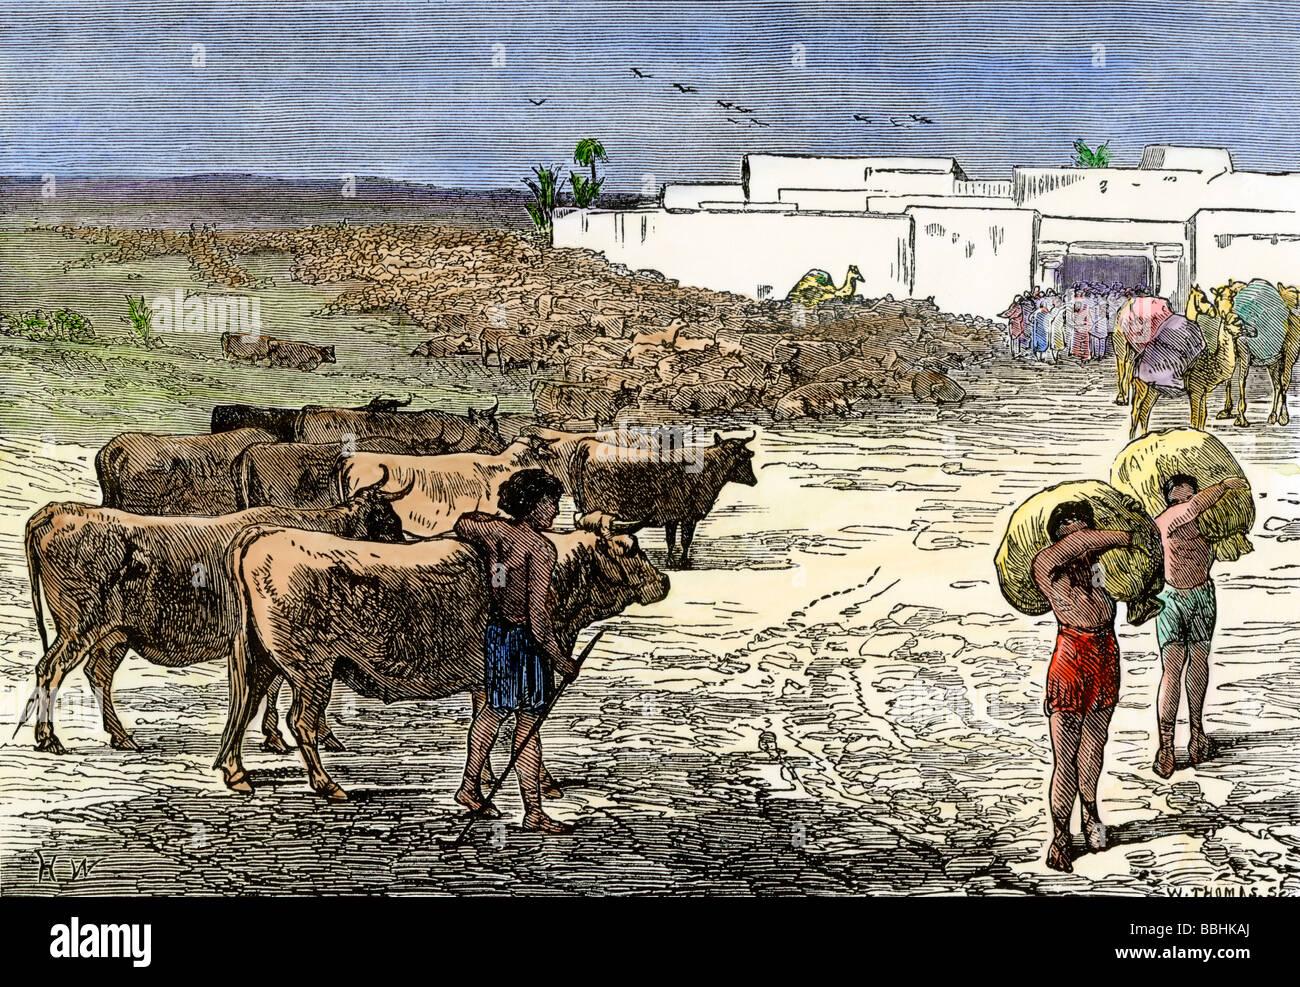 Joseph Of Egypt Receiving Cattle In Exchange For Bread